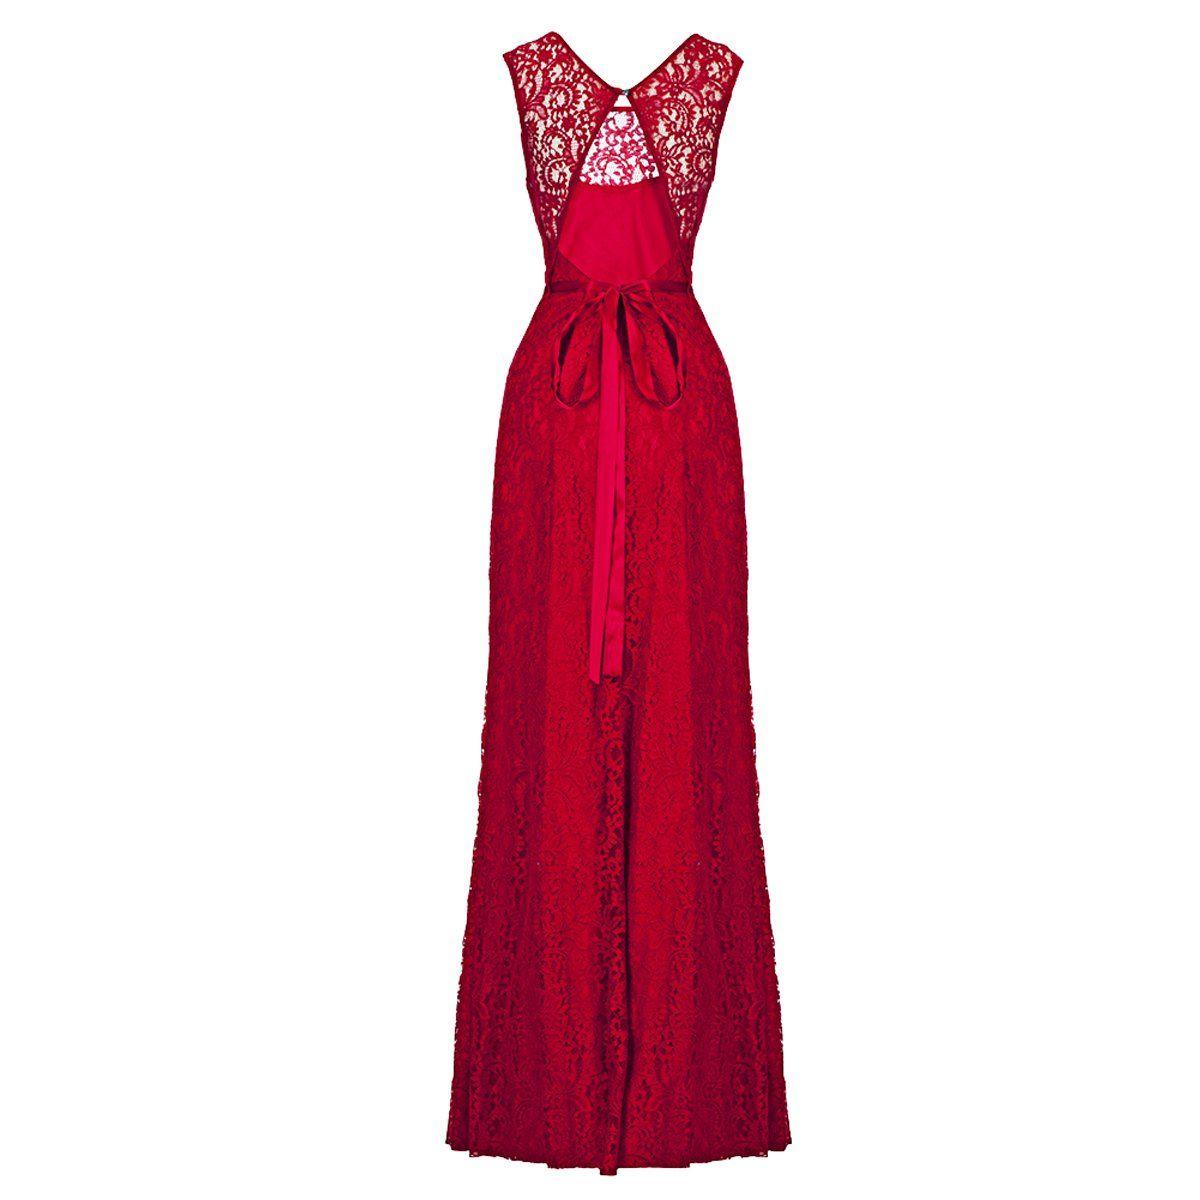 Vestido Nikki Italy De Encaje Searscommx Me Entiende